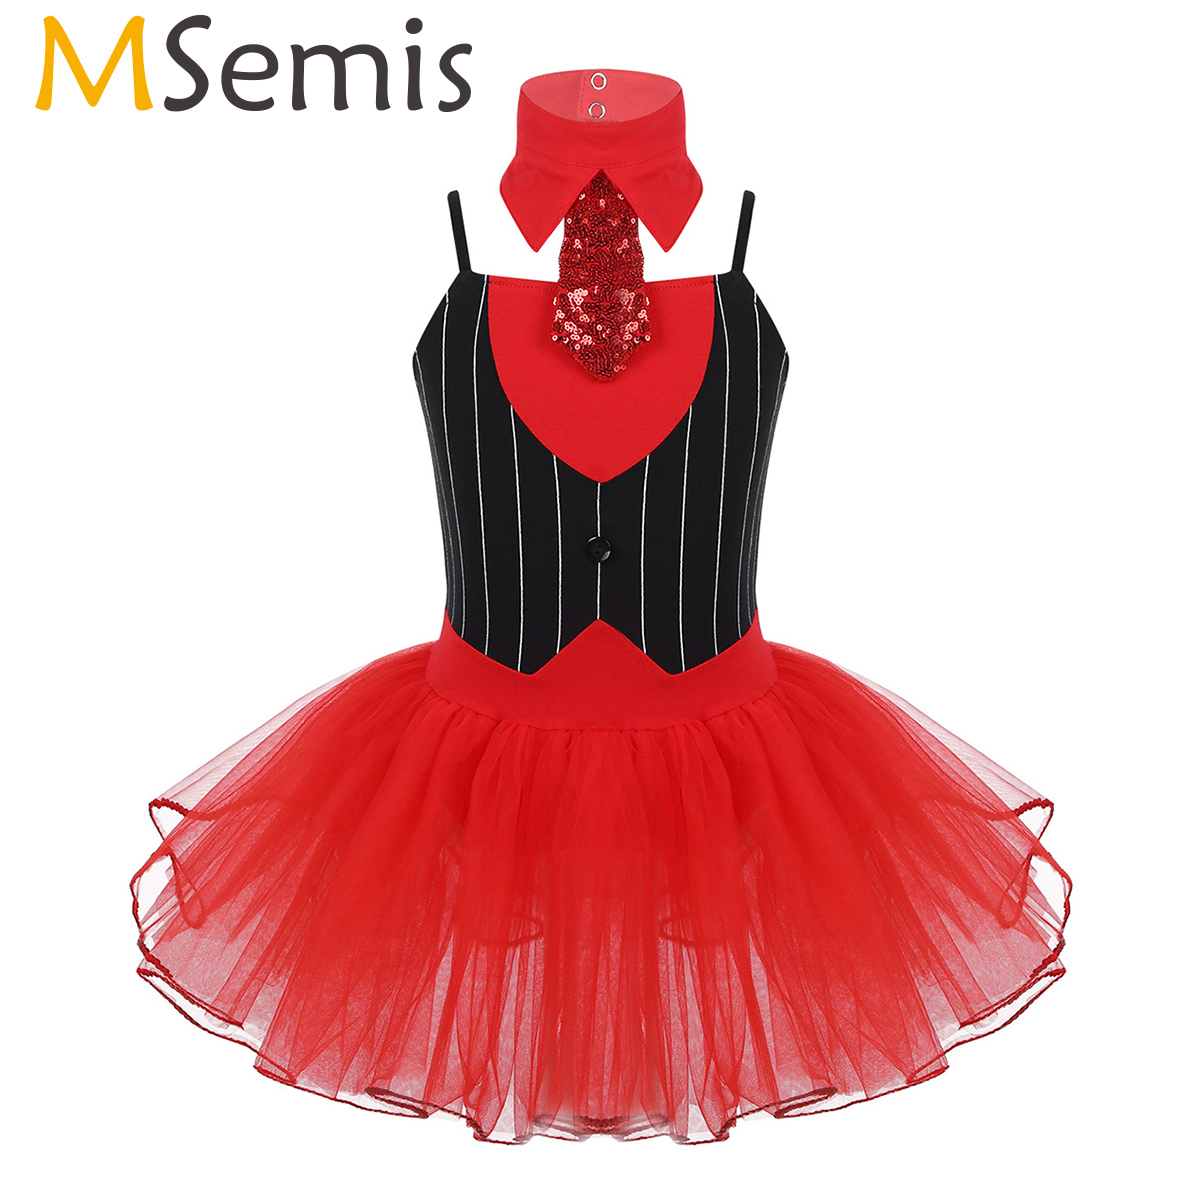 Kids Girls Christmas Dance Circus Ringmistres Costume Outfit With Tie Gymnastics Leotard Ballet Tutu Skirts Figure Skating Dress